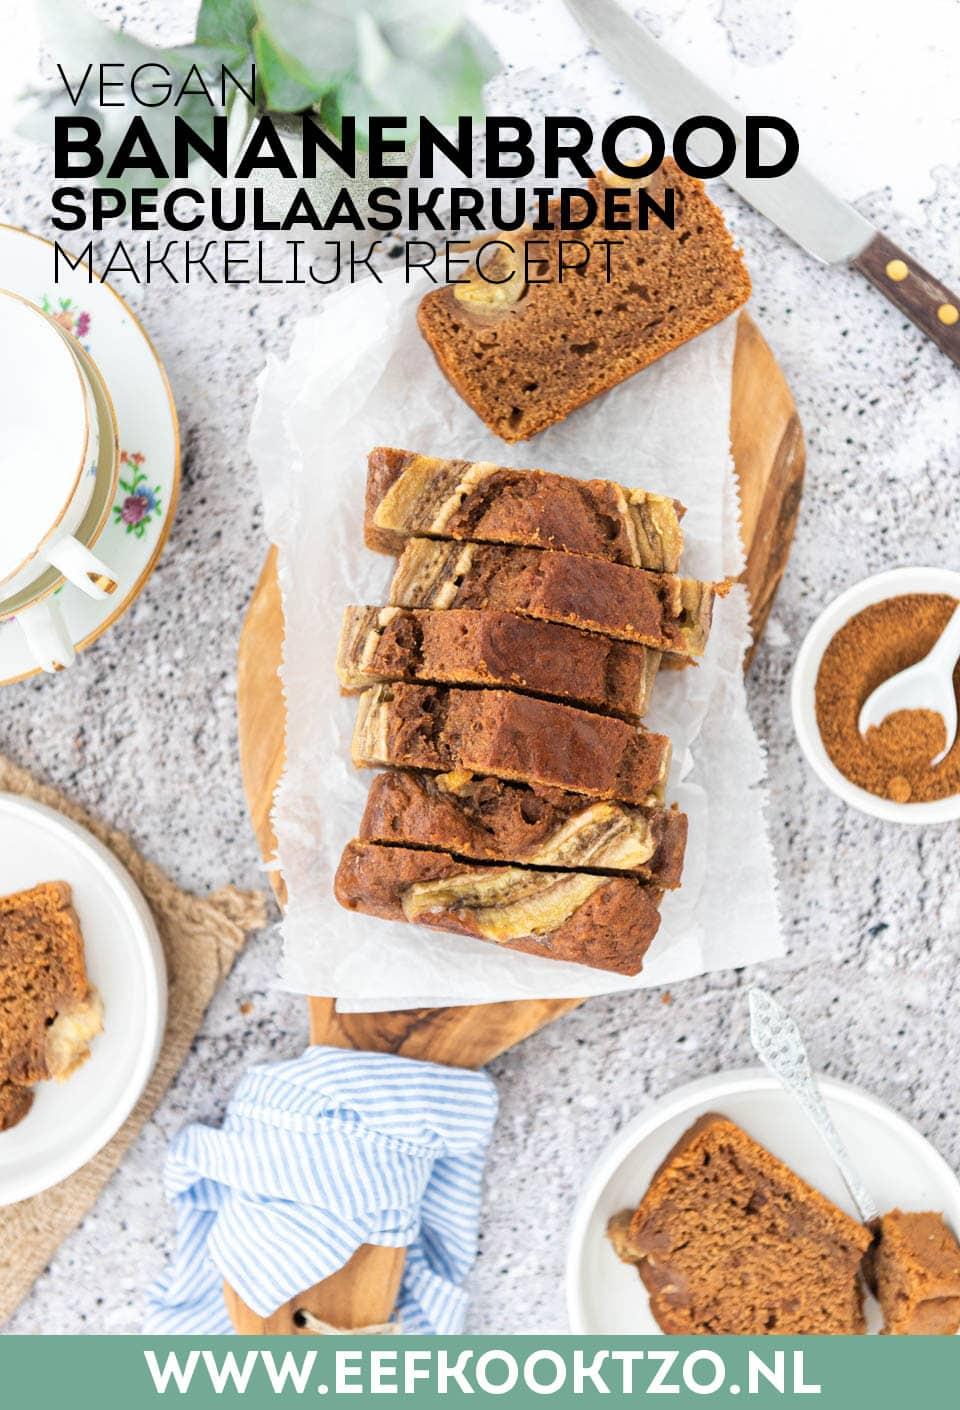 Vegan bananenbrood Pinterest collage